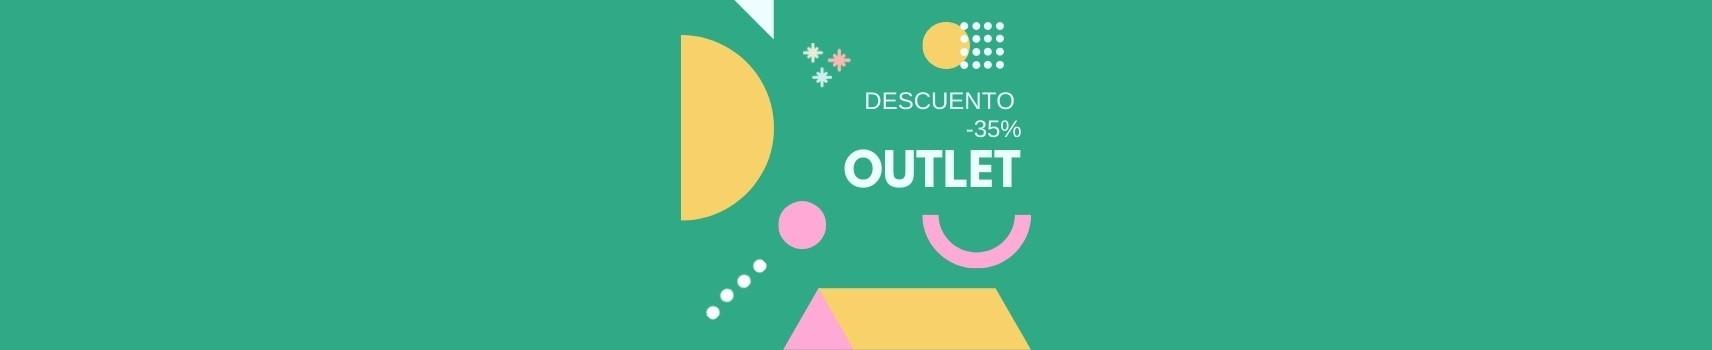 DESCUENTO -35%